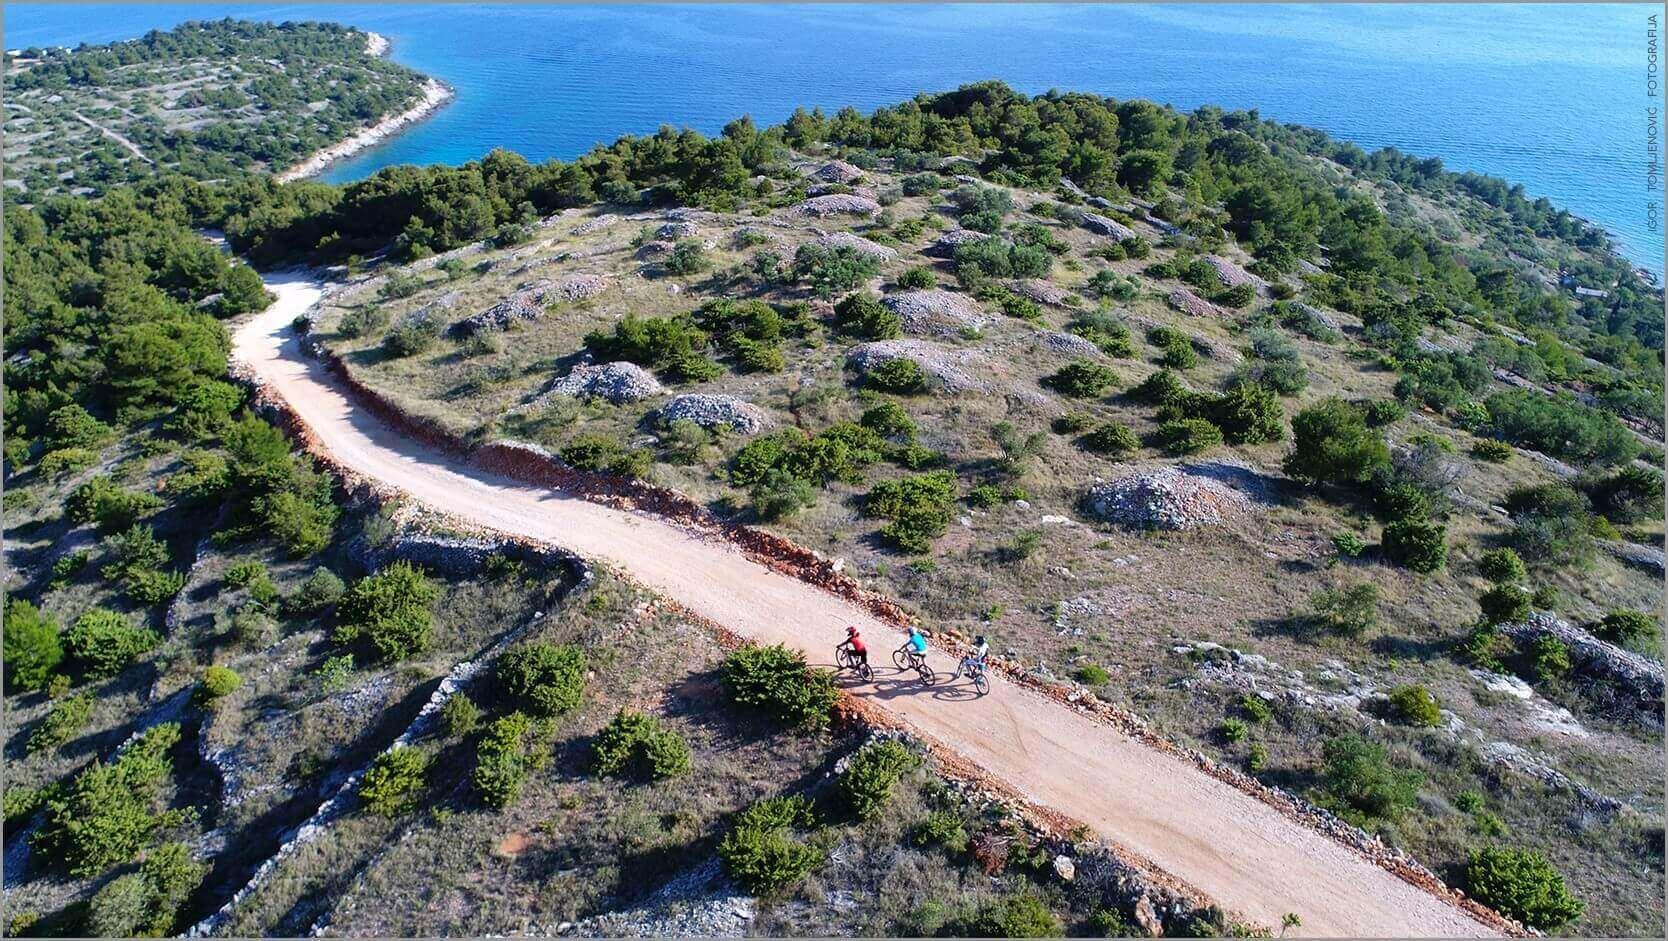 Biking on the island of Murter